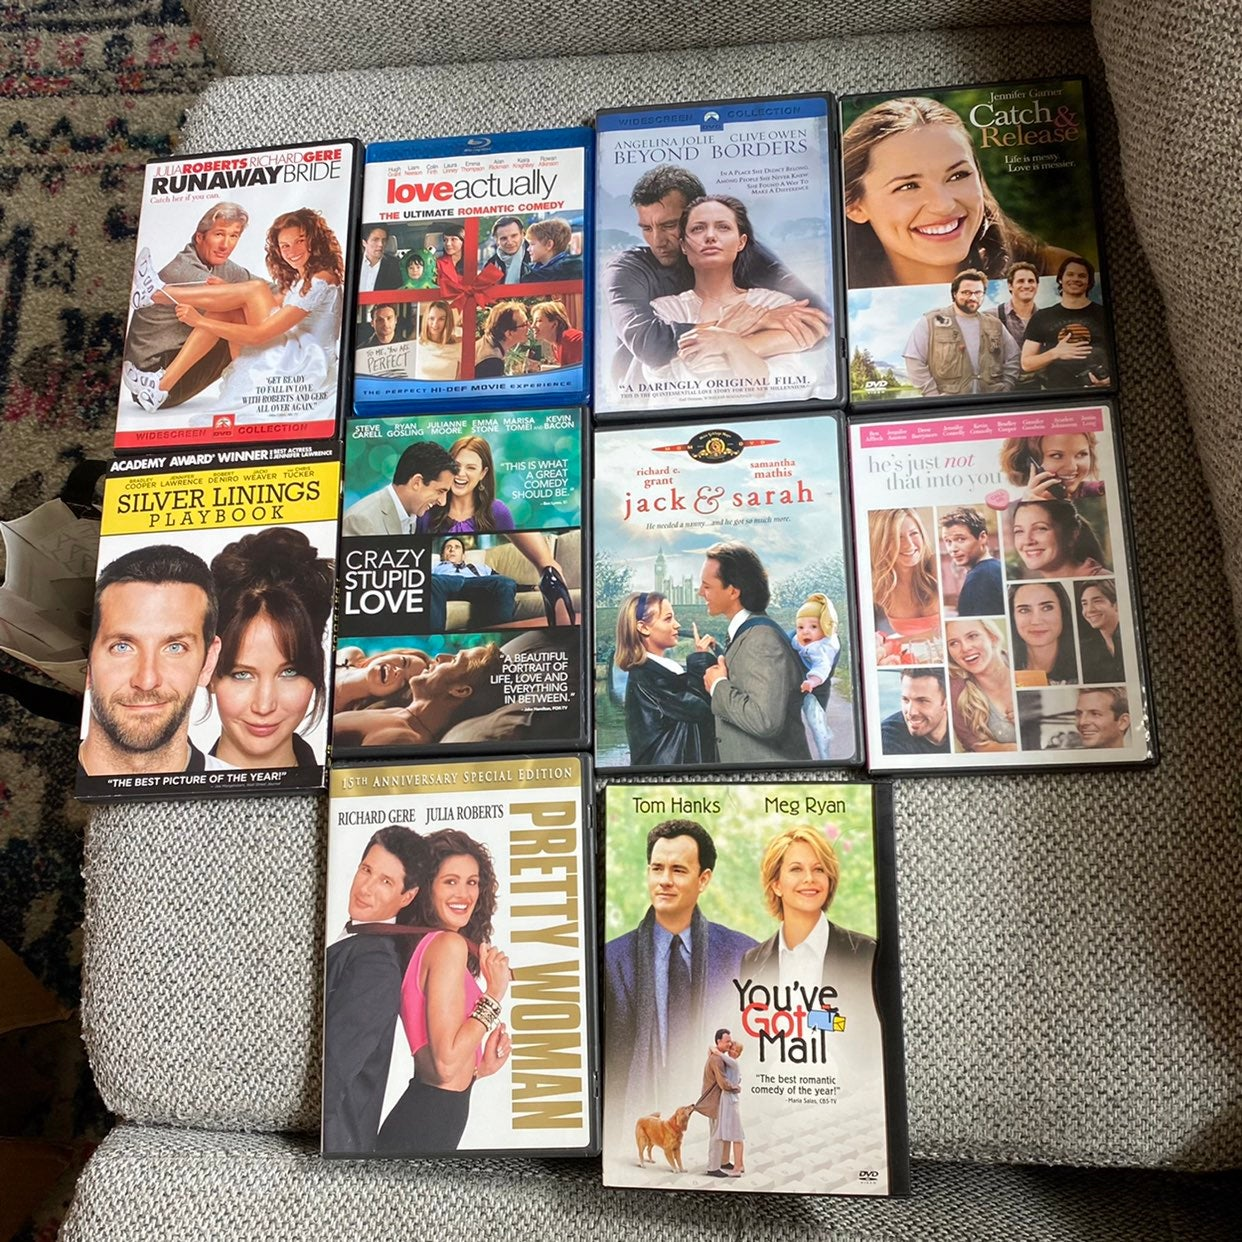 10 Romantic/Comedy Movies on DVD